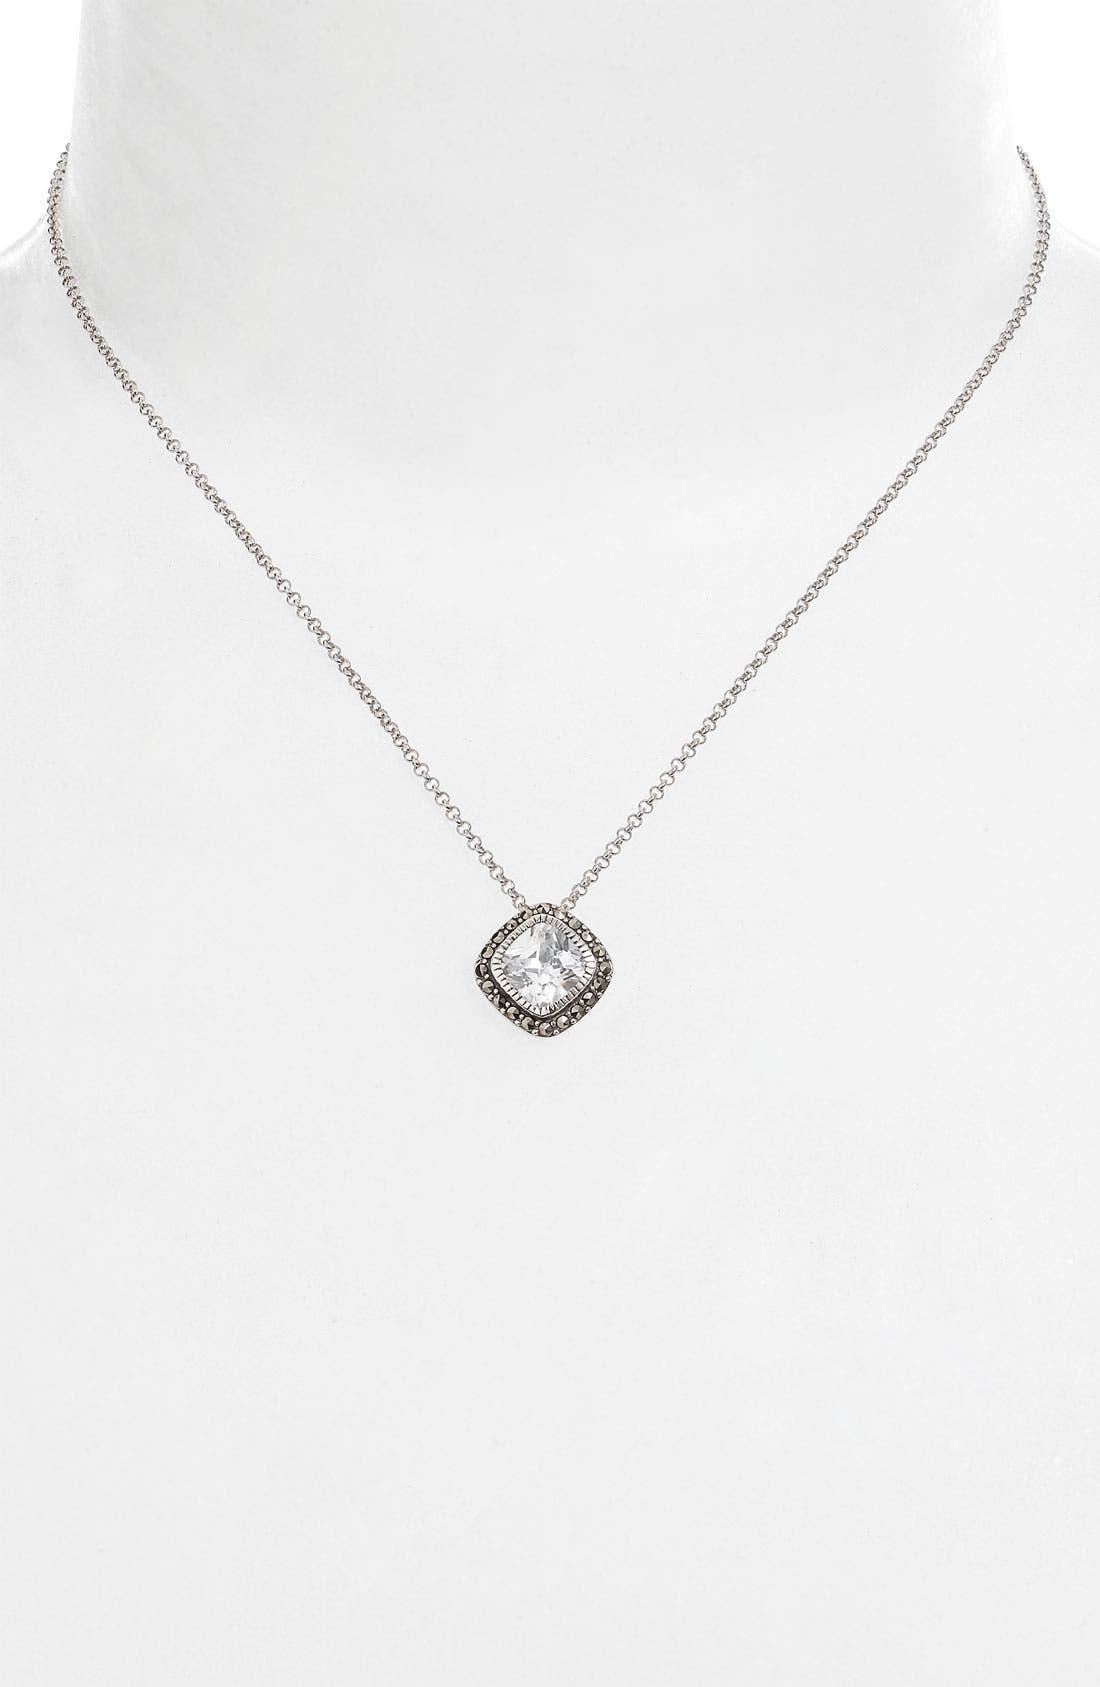 Main Image - Judith Jack 'Aquarius' Small Pendant Necklace